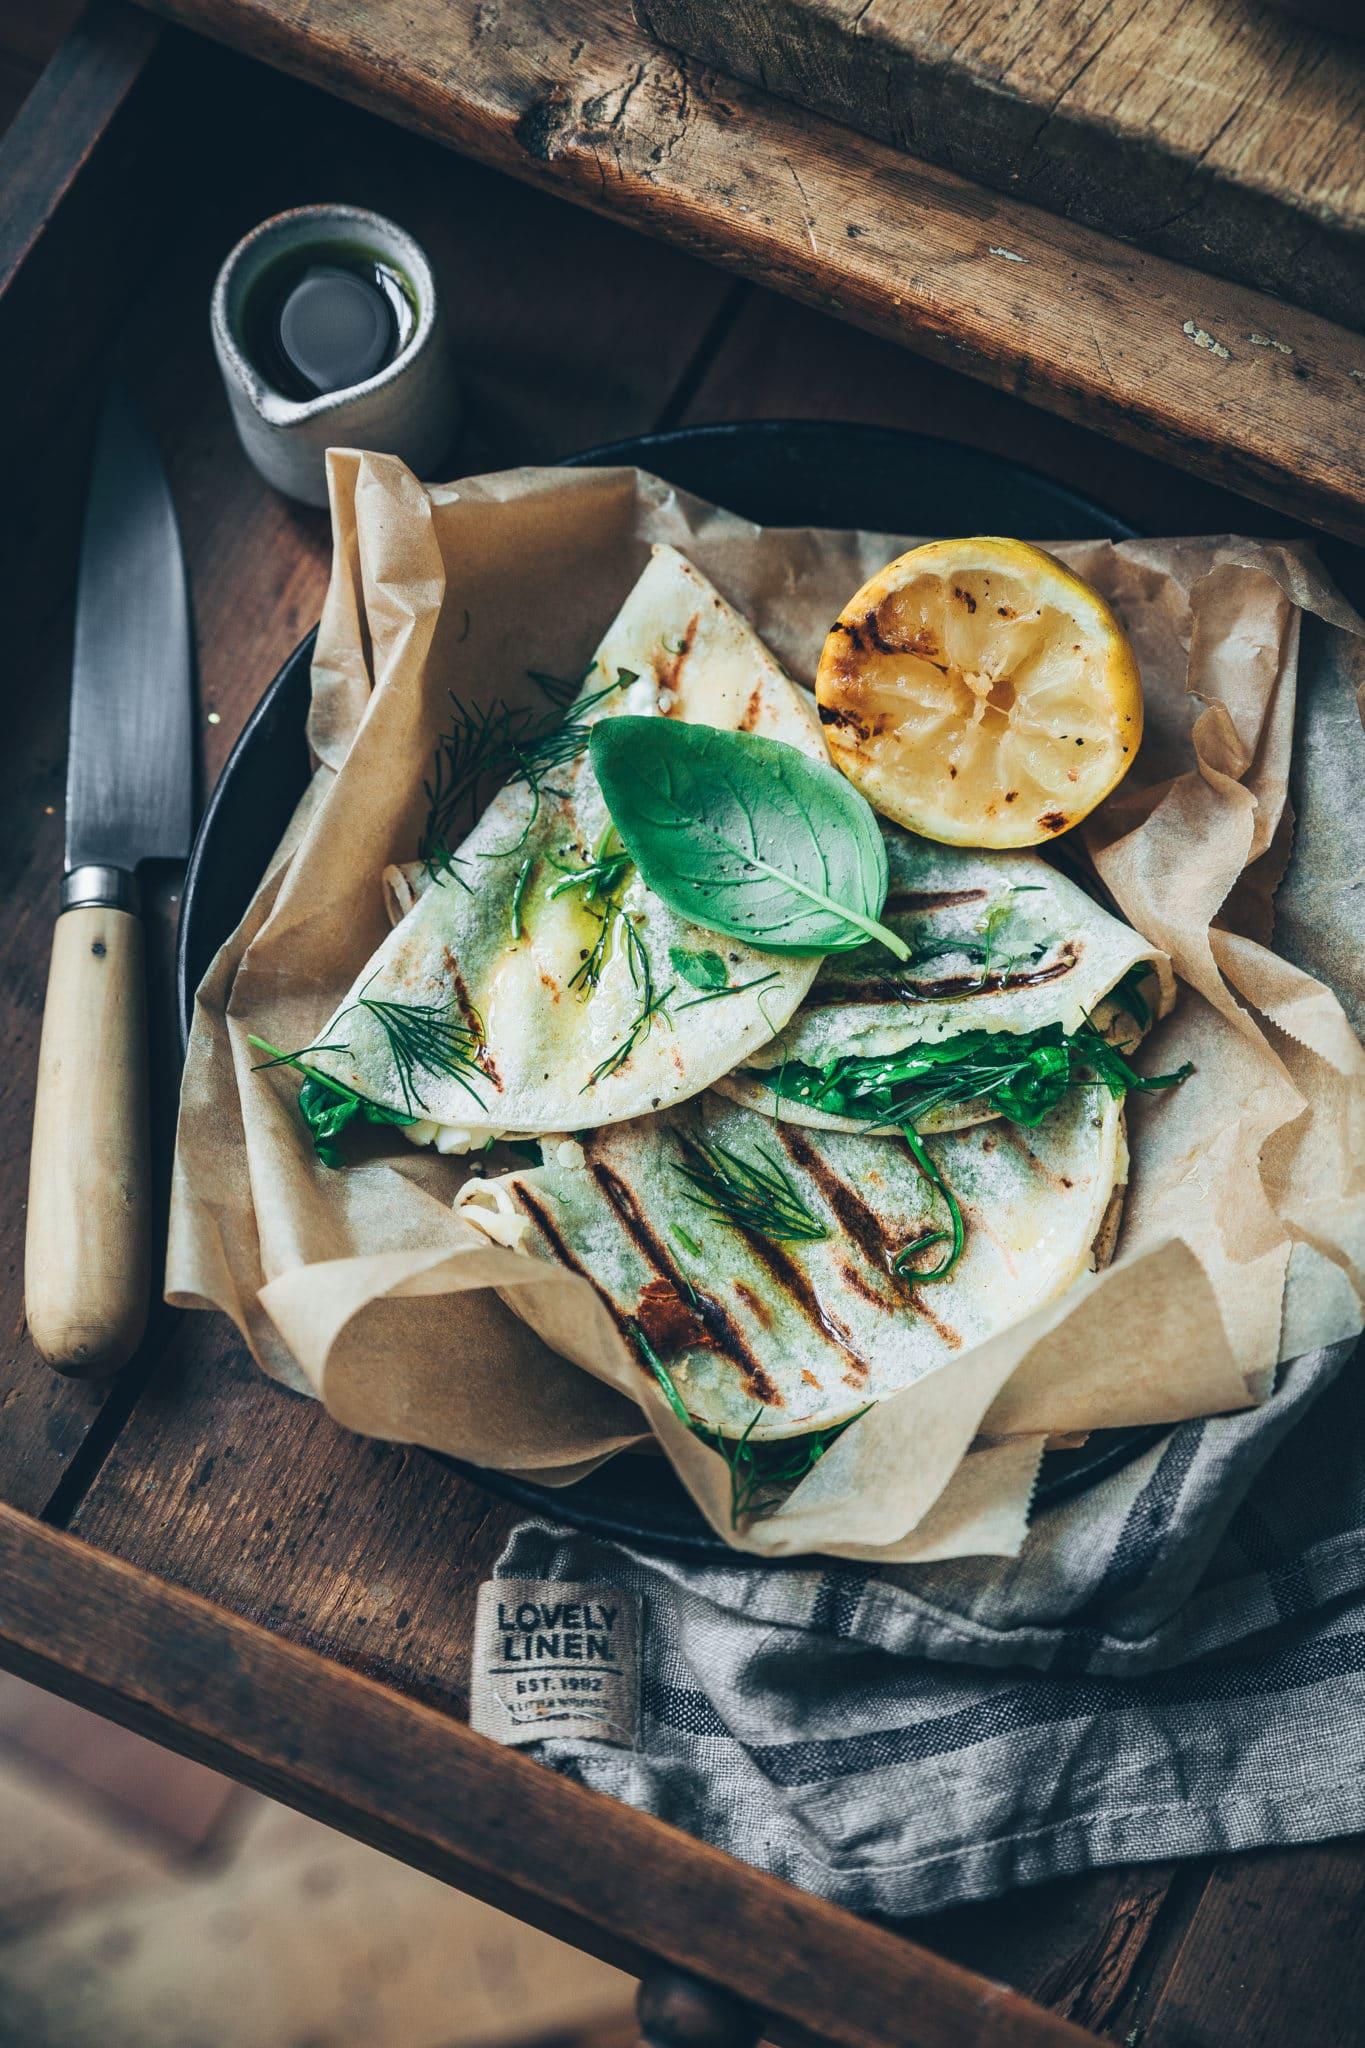 Quesadillas Megane Arderighi - styliste culinaire megandcook